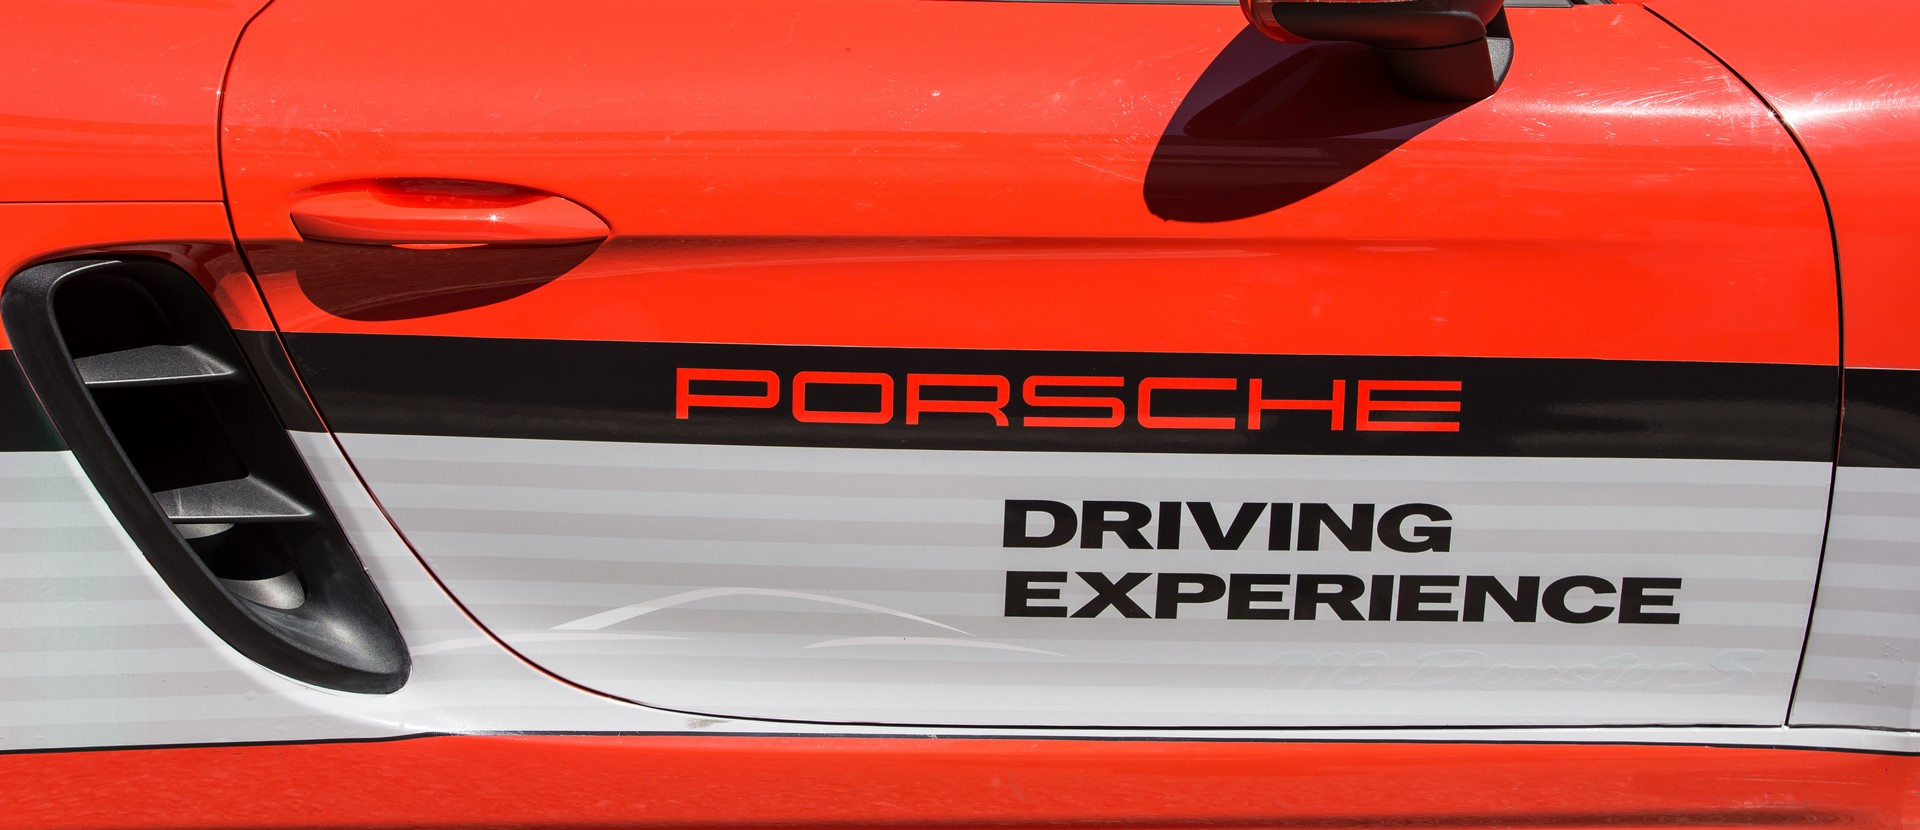 Porsche Driving Experience 2017 Serres (149)